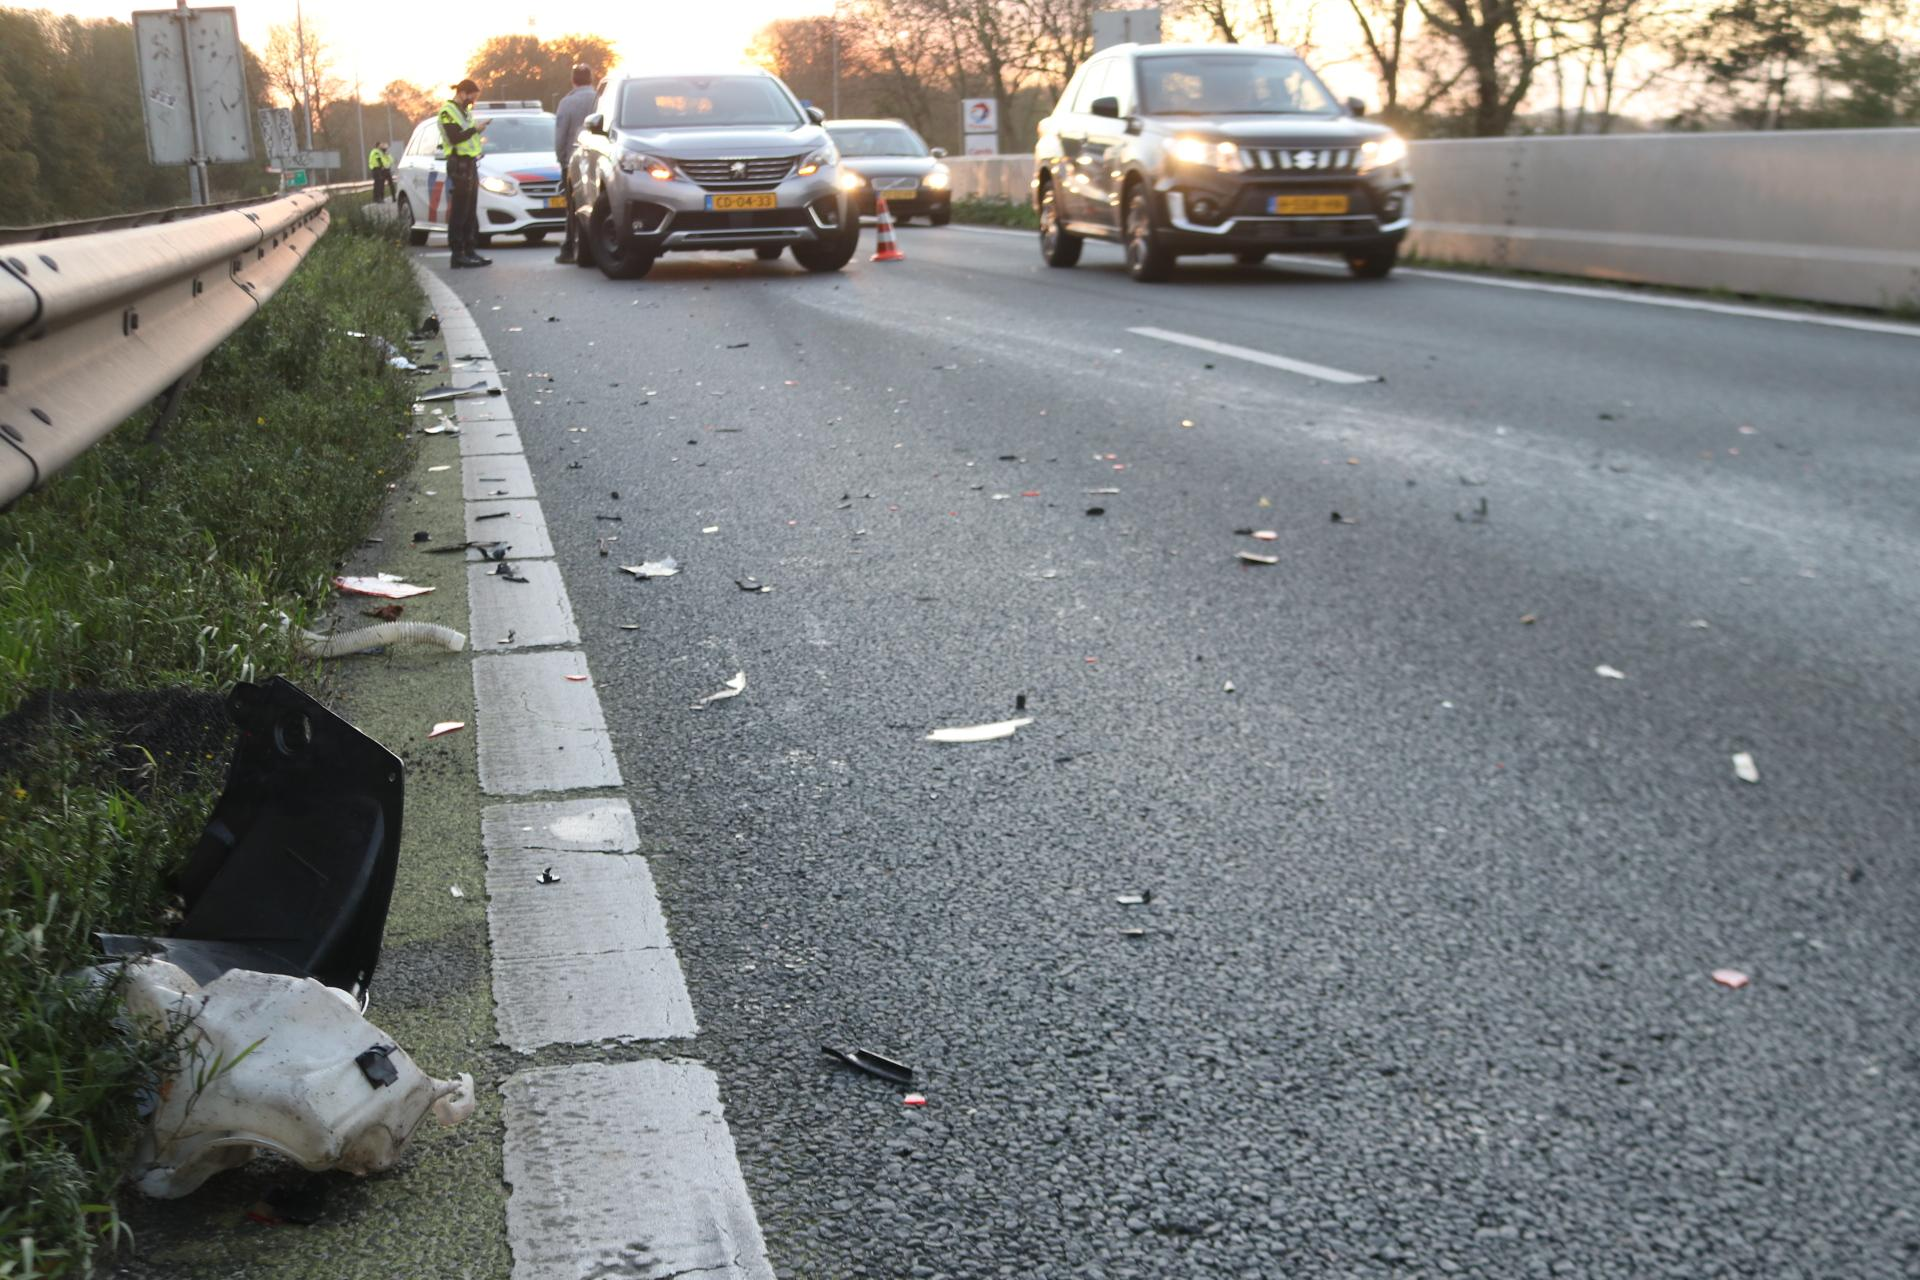 Ongeval op A44 zorgt voor lange file richting Amsterdam